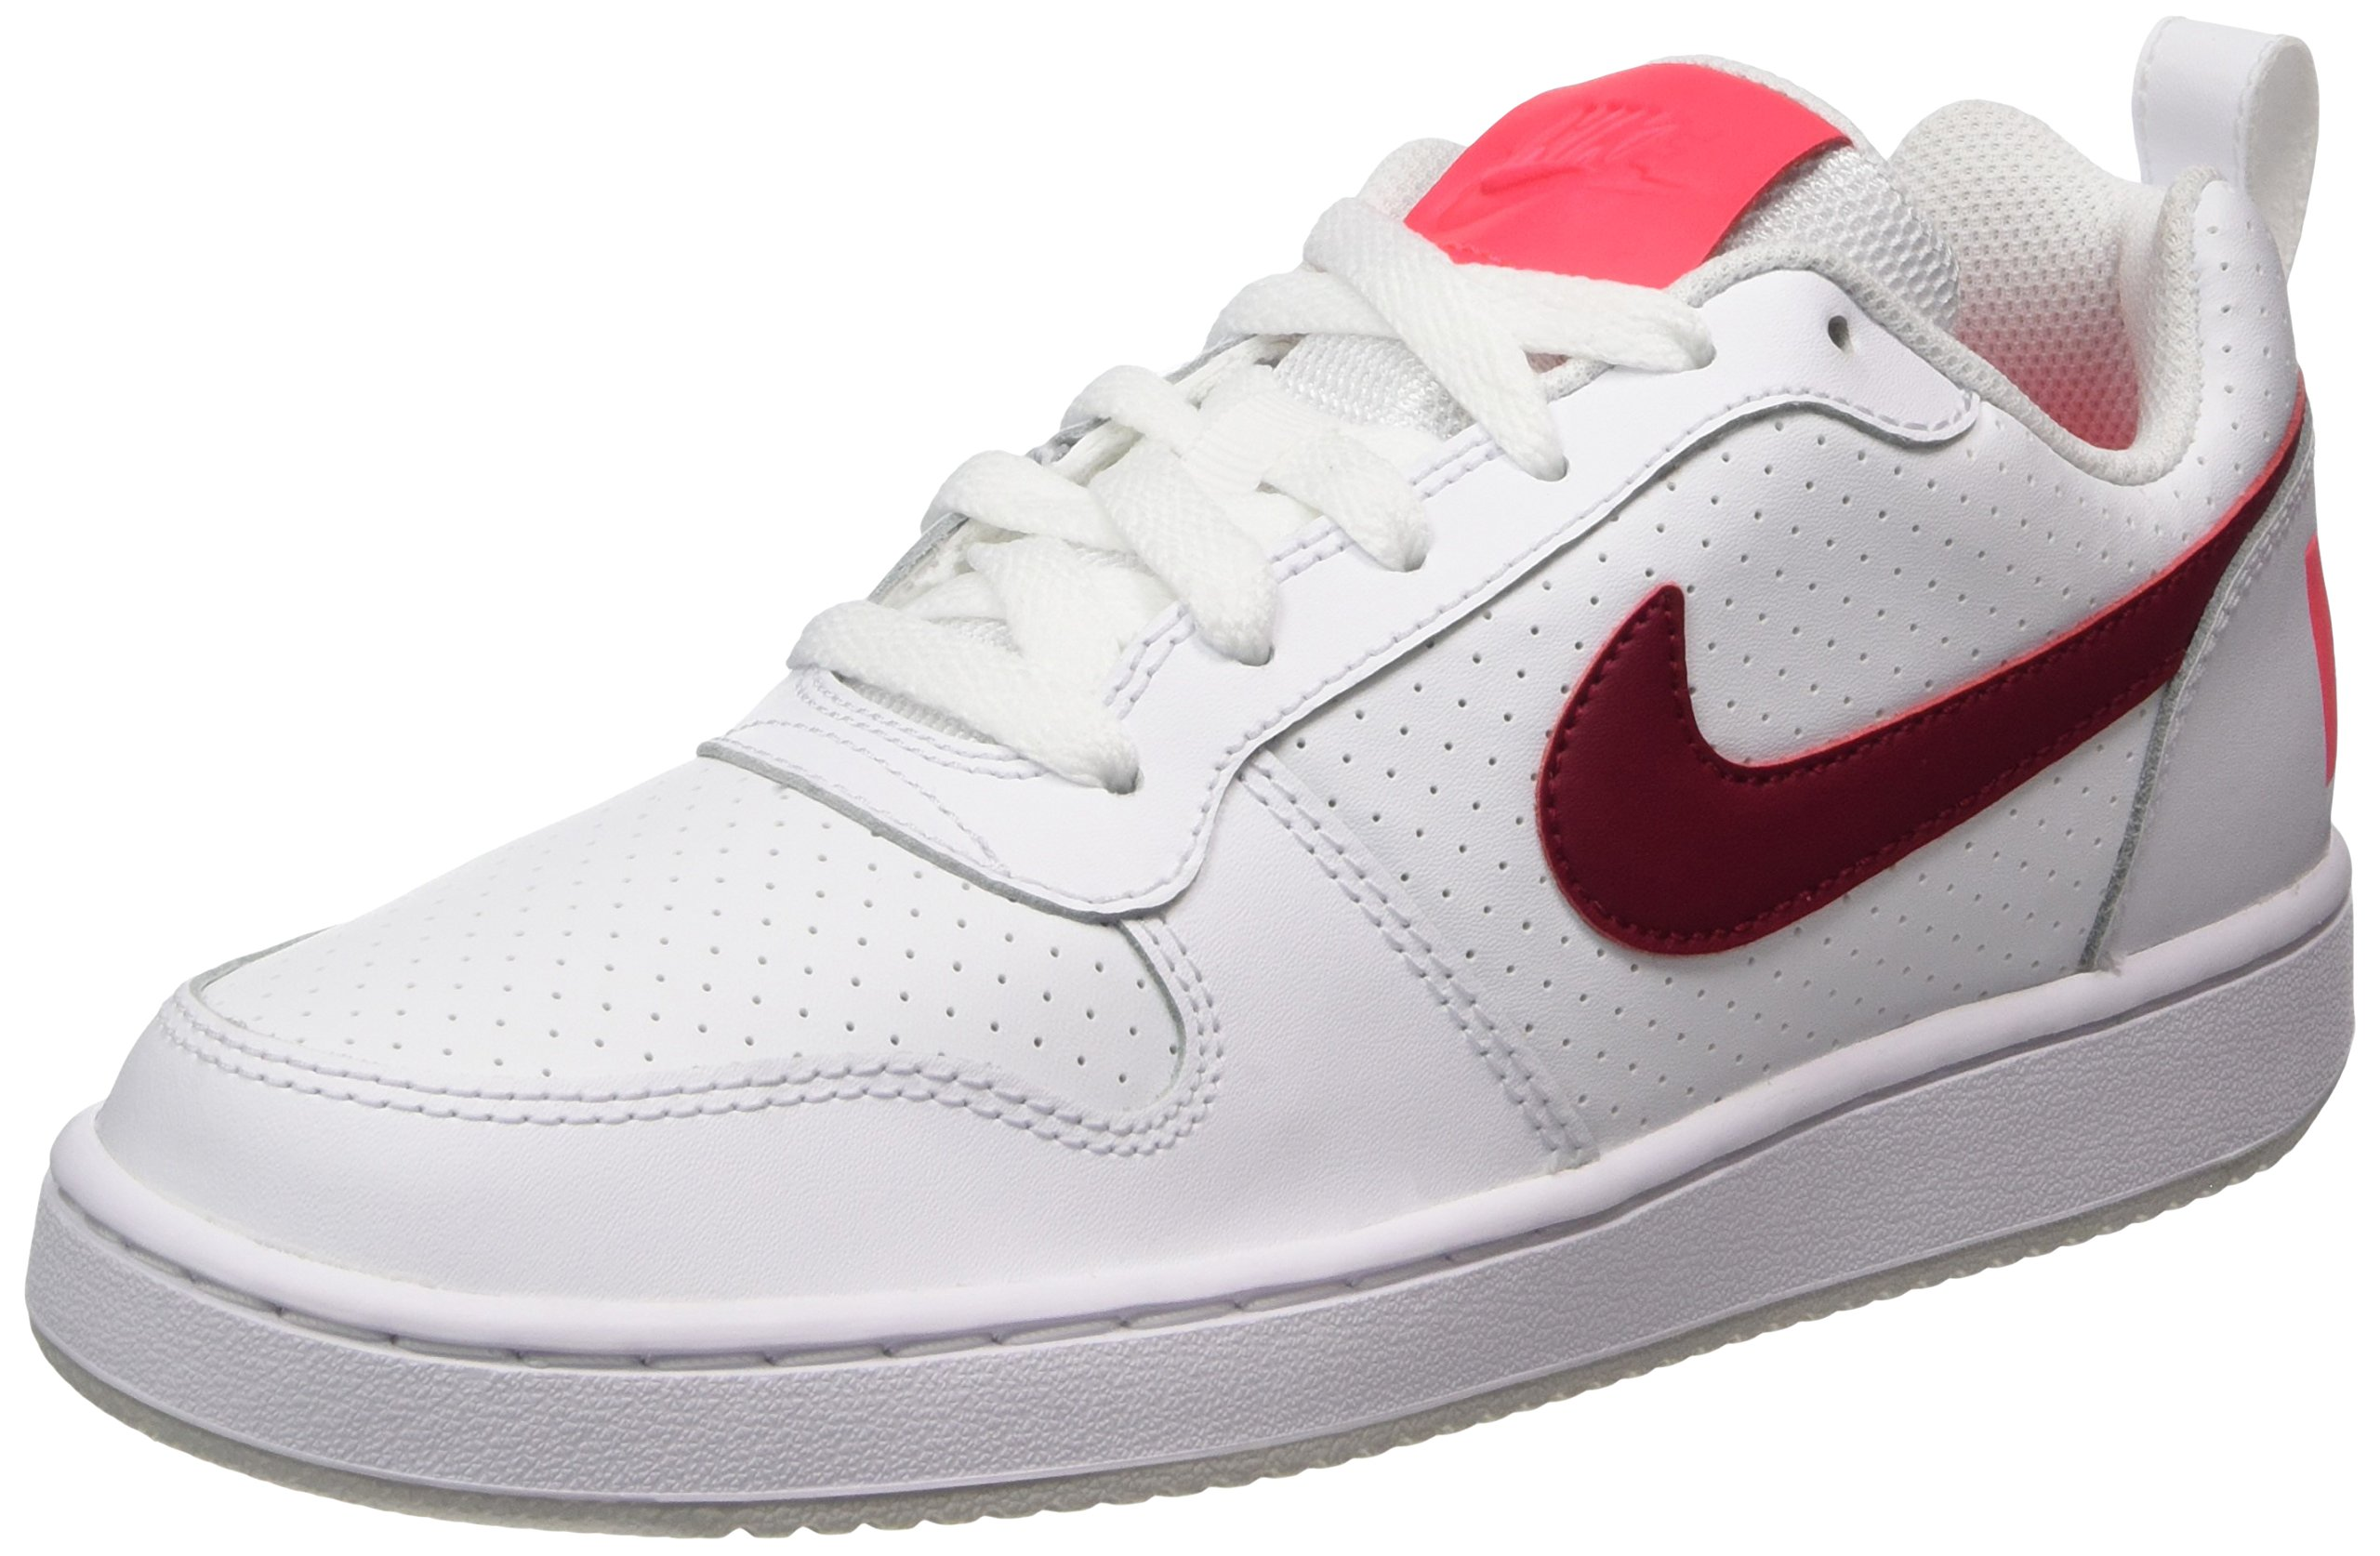 noble Red FemmeBlancwhite pure Court Eu Nike LowBaskets Platinum38 Borough Solar HeEbWD9Y2I